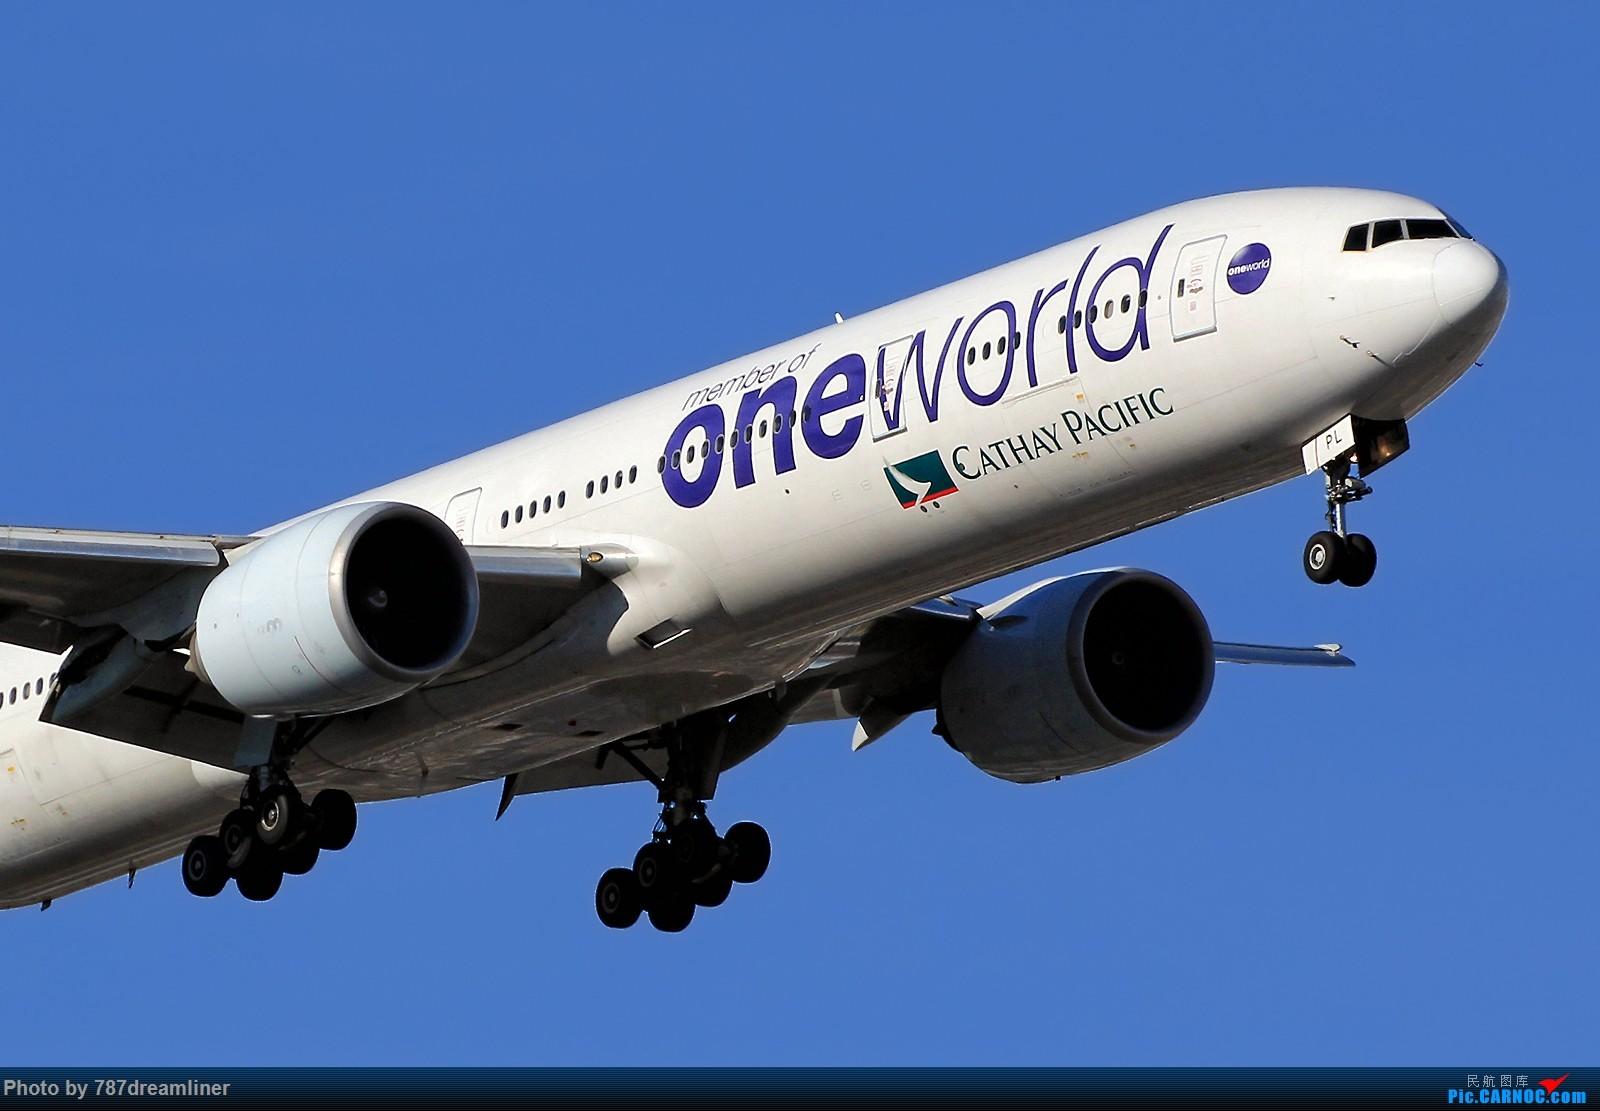 Re:【国泰航空77W组图】标涂、新装、彩绘,你更喜欢哪一个? BOEING 777-300ER B-KPL 美国芝加哥奥黑尔国际机场